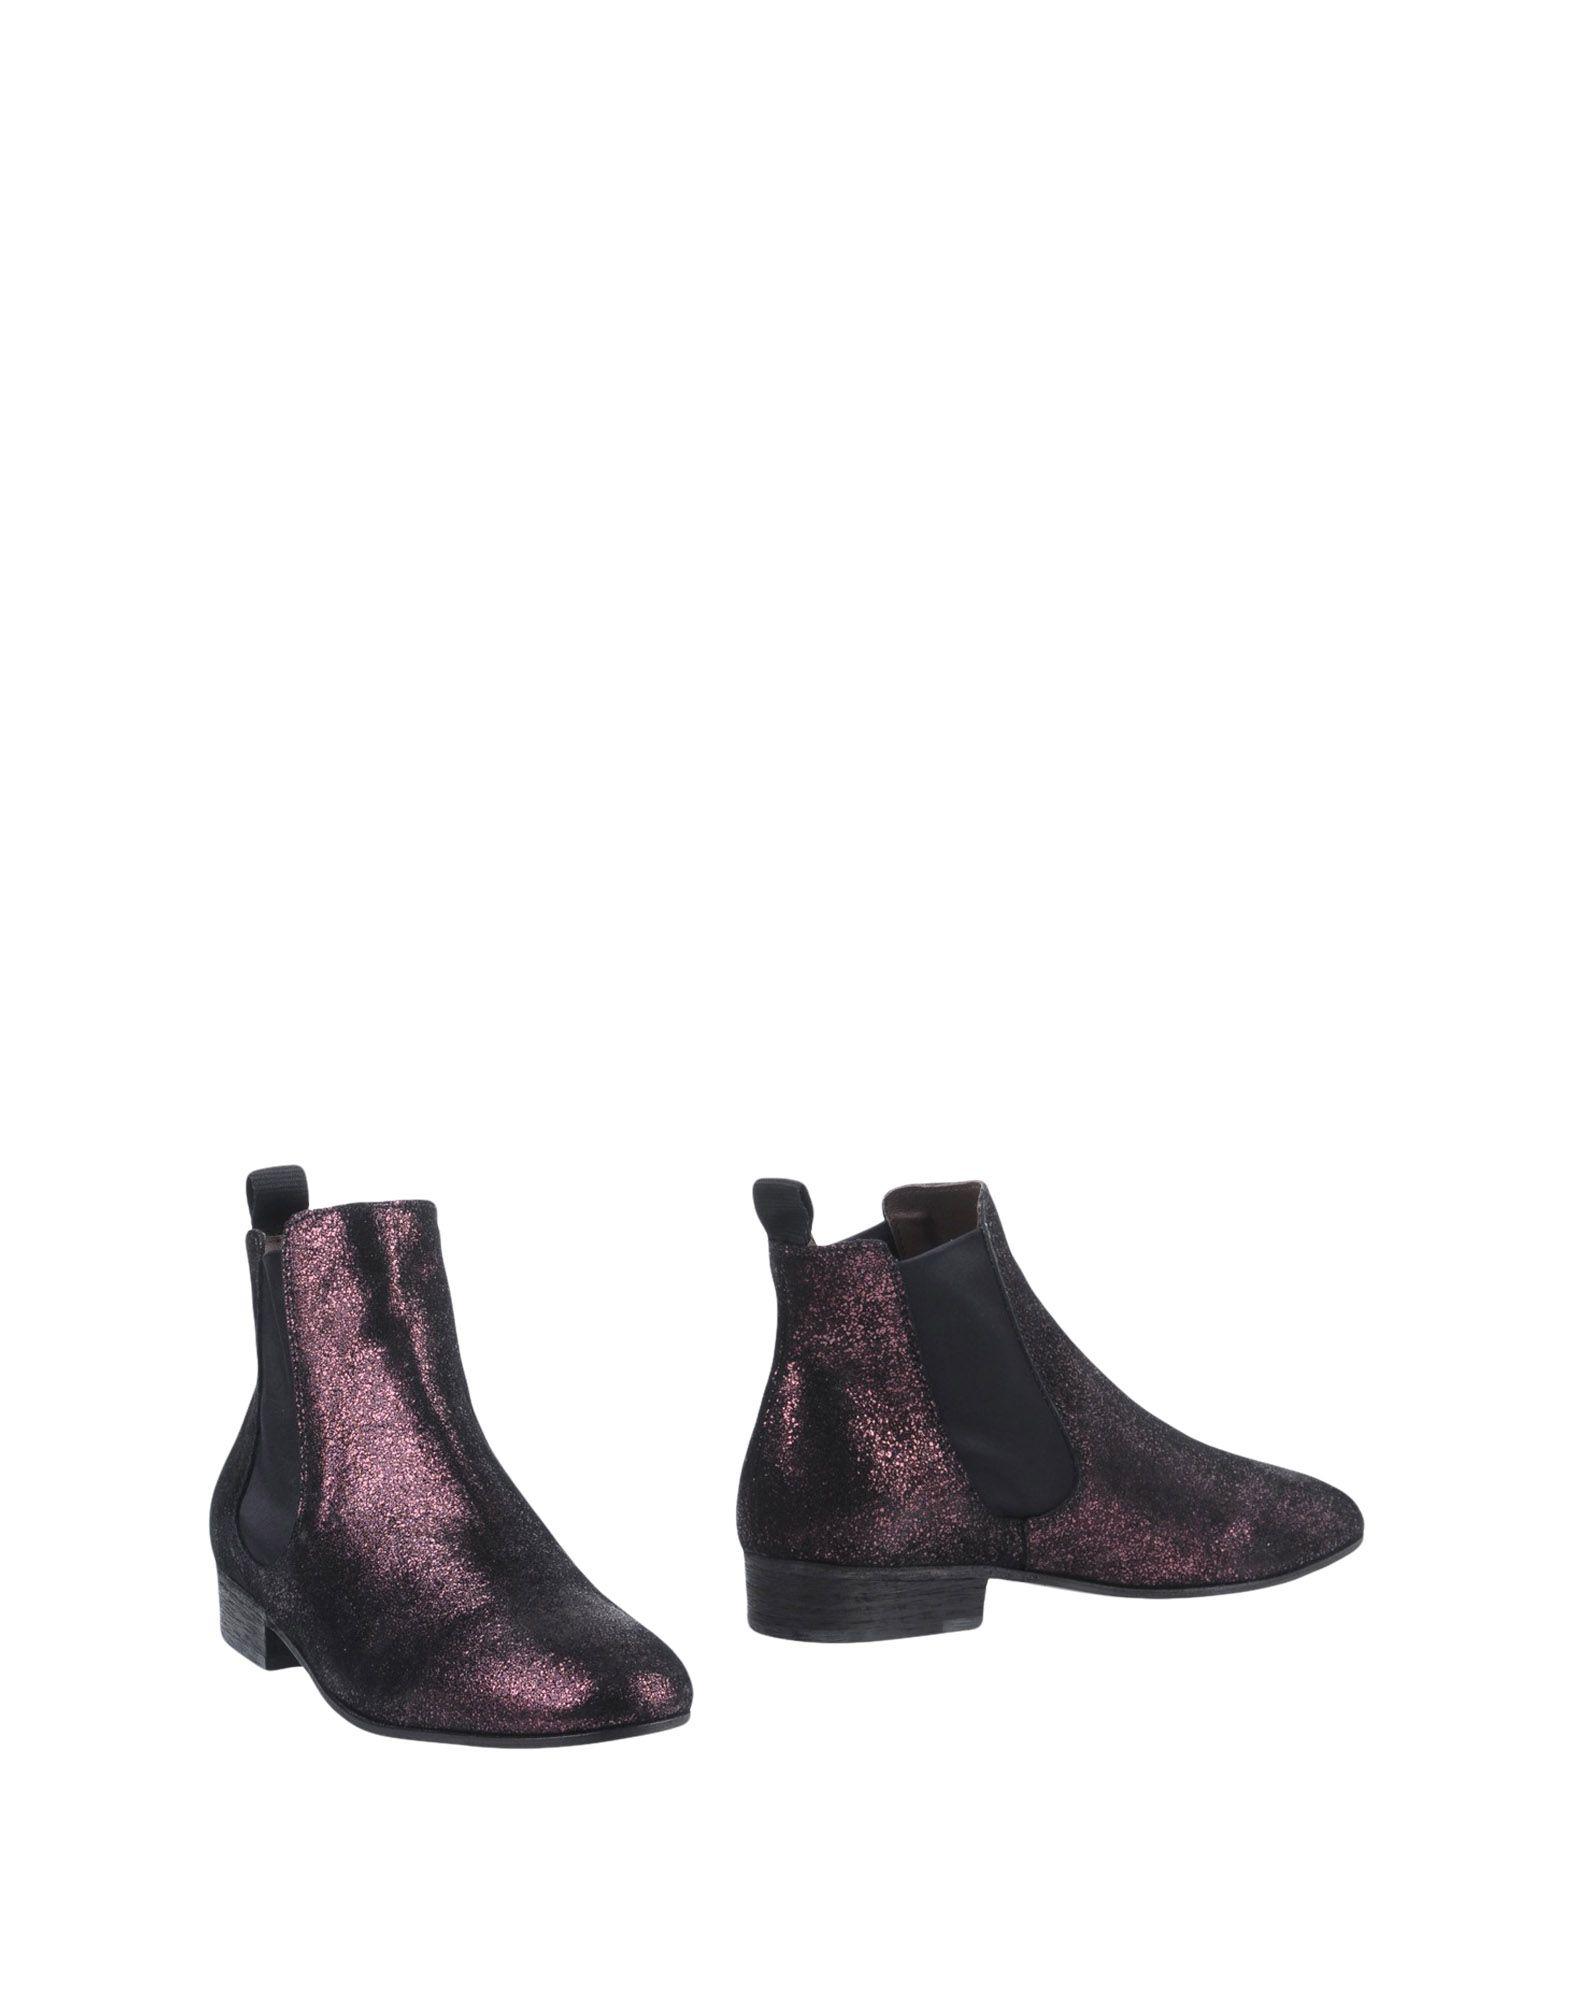 Boemos Chelsea Boots Damen  11318269NU Gute Qualität beliebte Schuhe